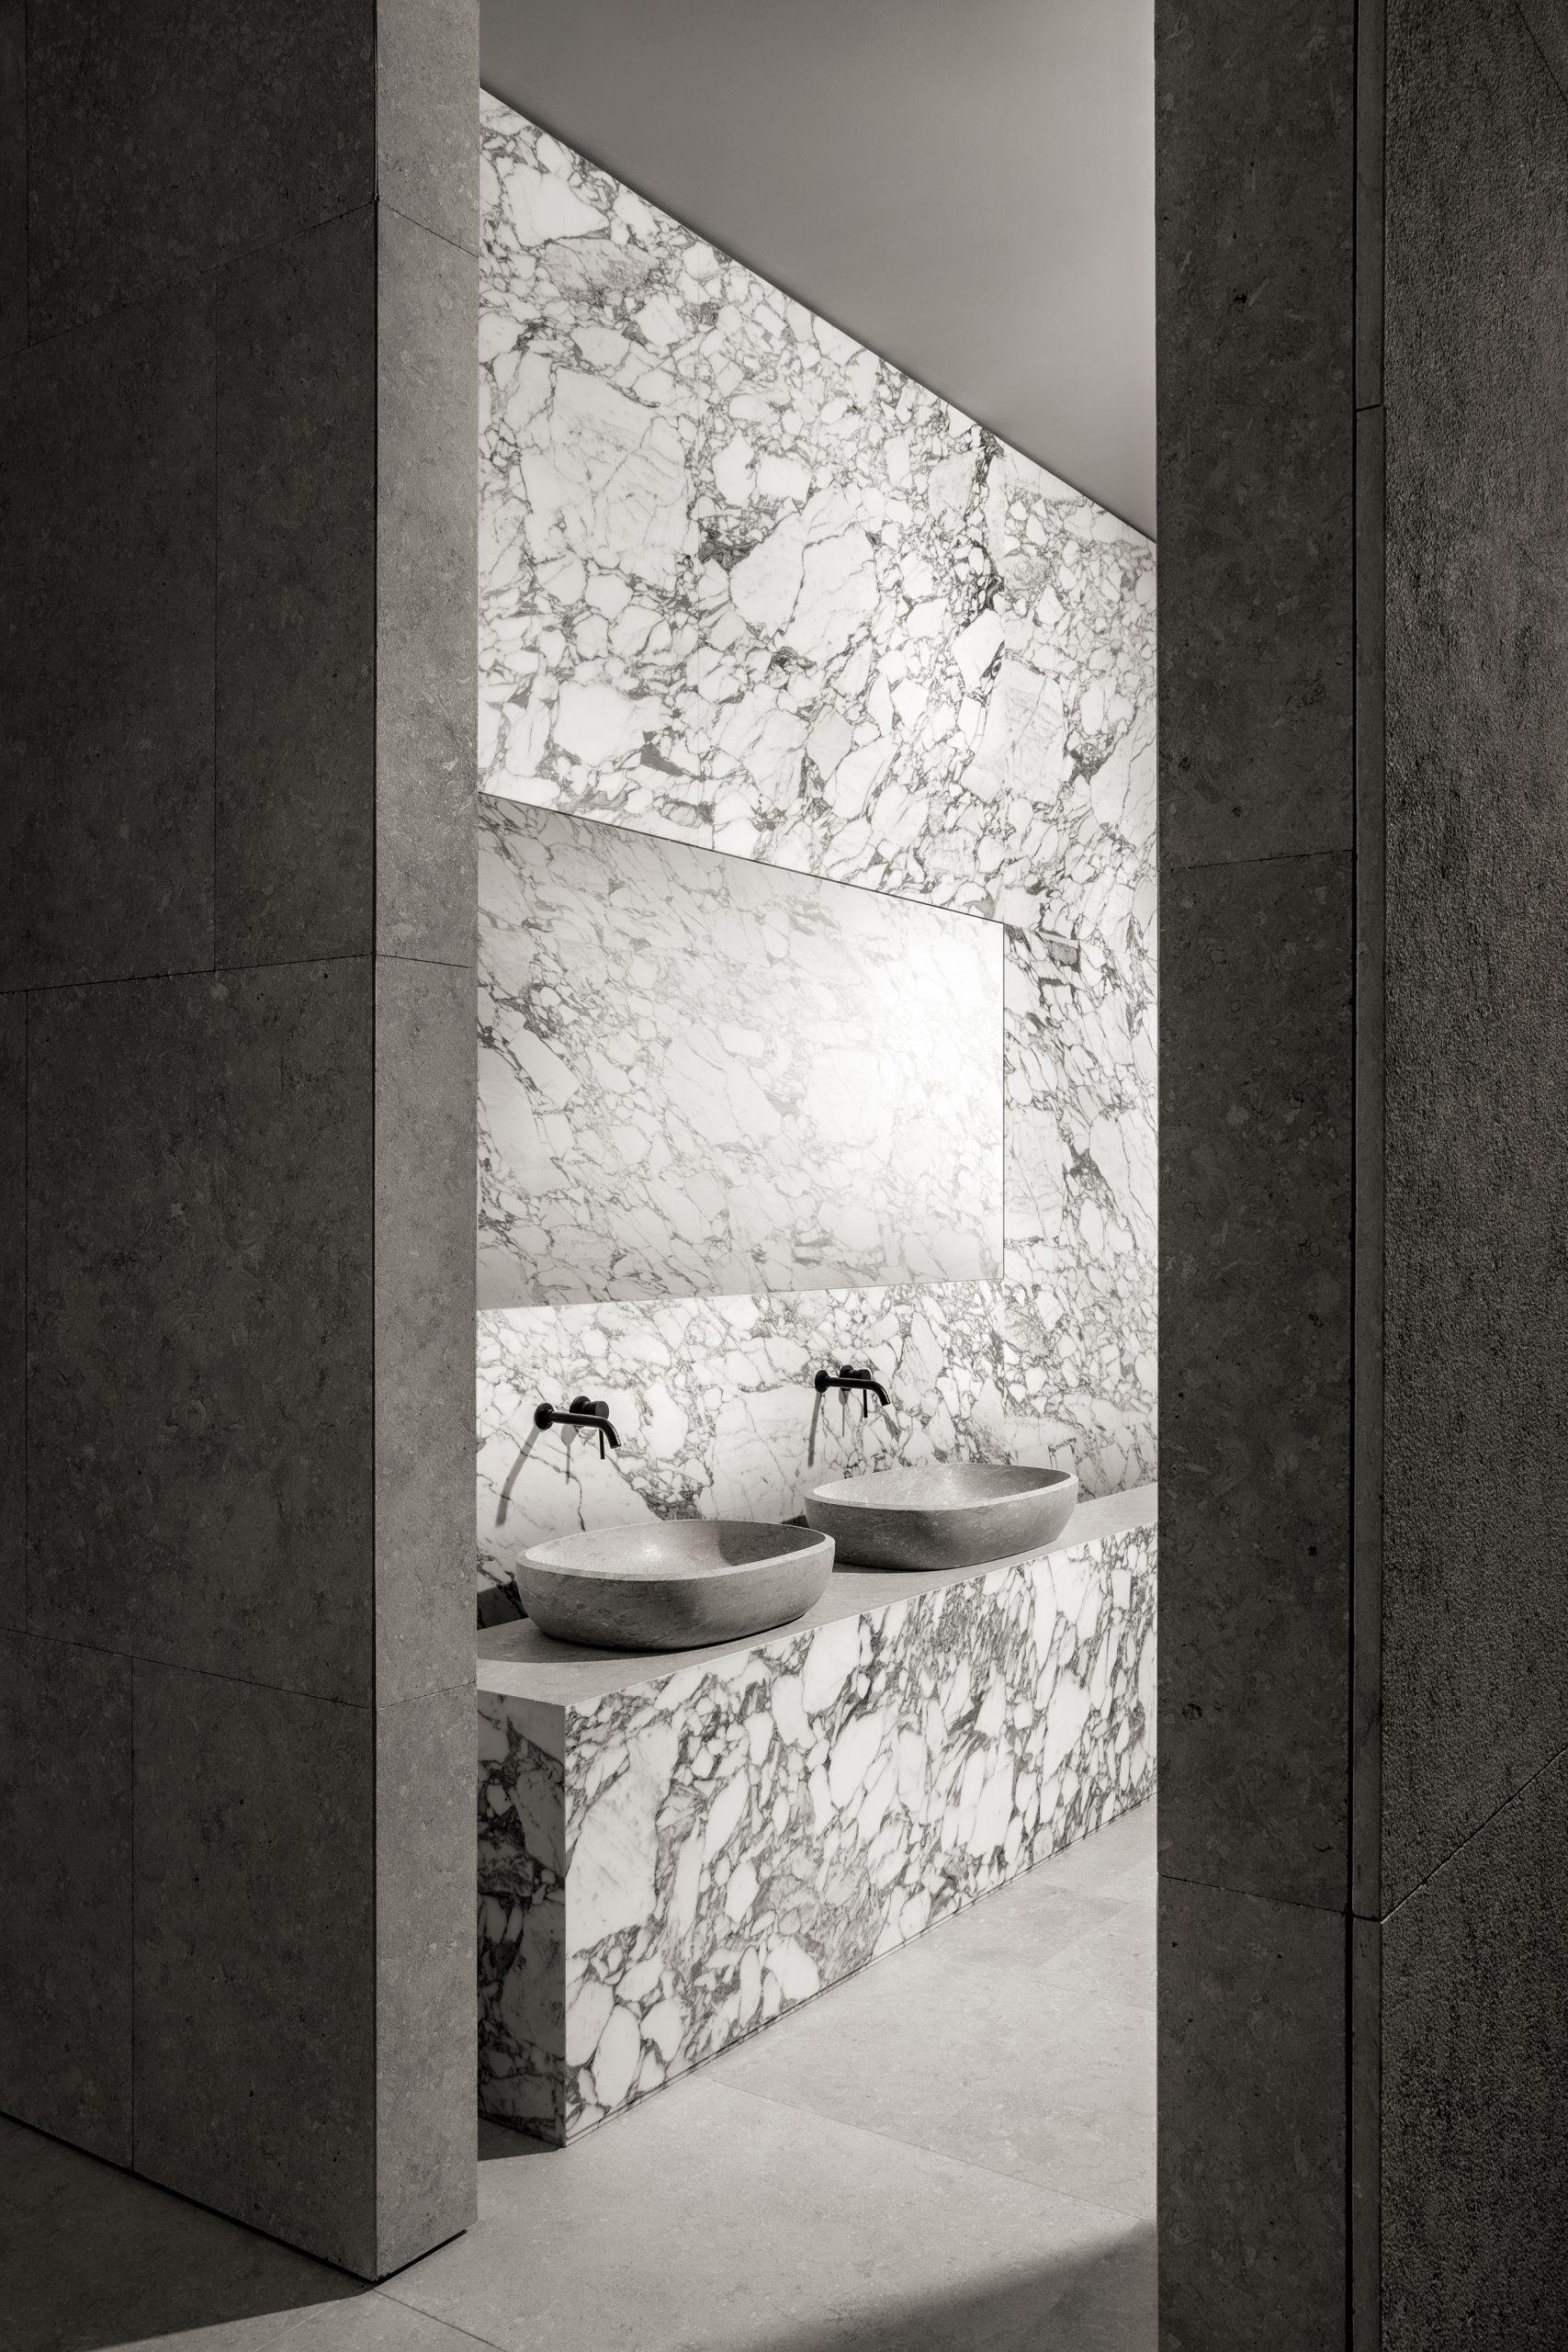 Dolina natural stone washbowl designed by Debiasi Sandri for Grassi Pietre